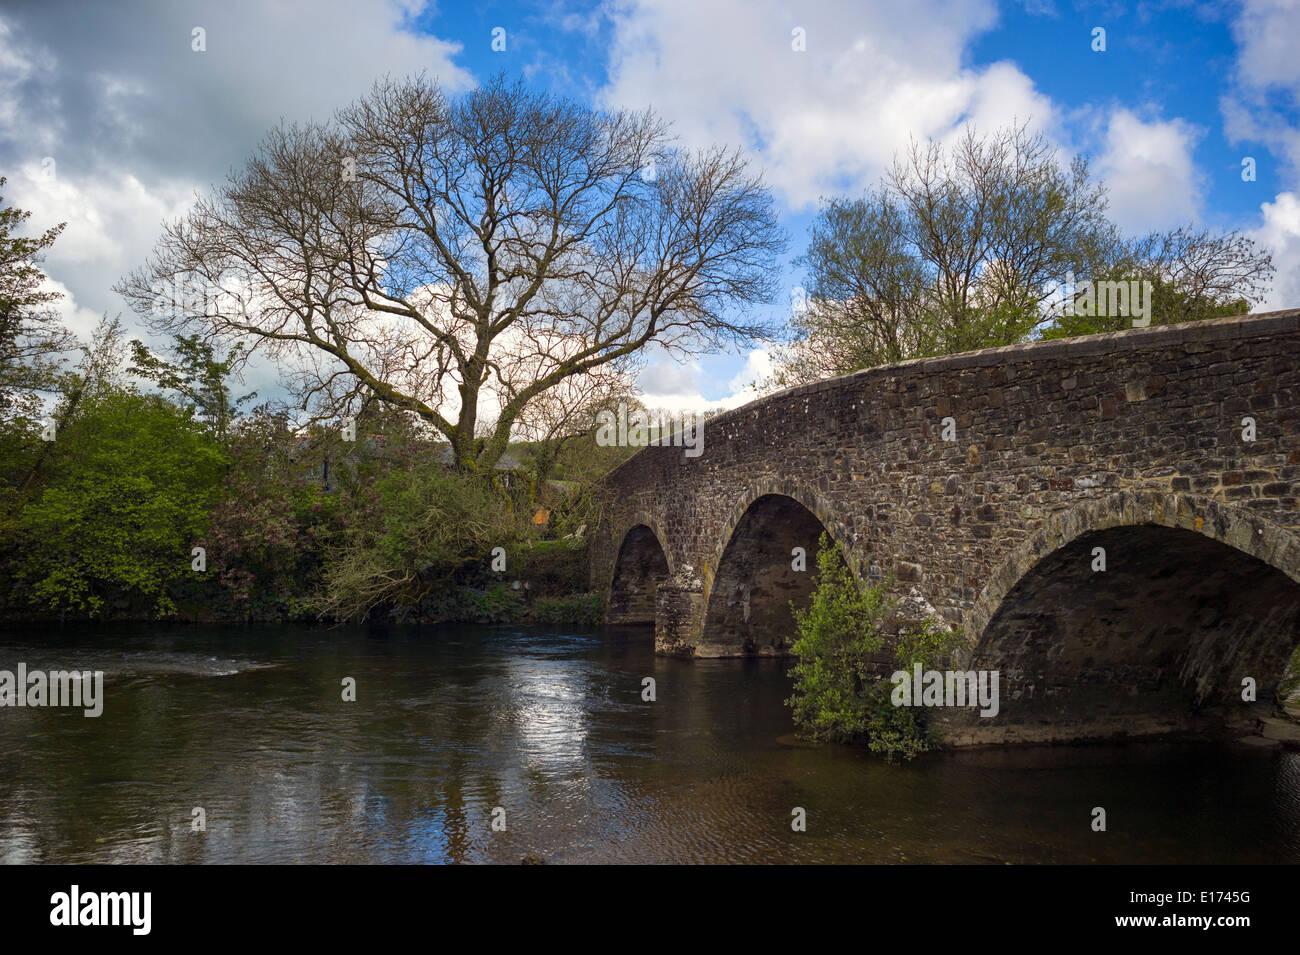 Bridge over the River Exe at the village of Exebridge, near Dulverton, on the Somerset and Devon border - Stock Image